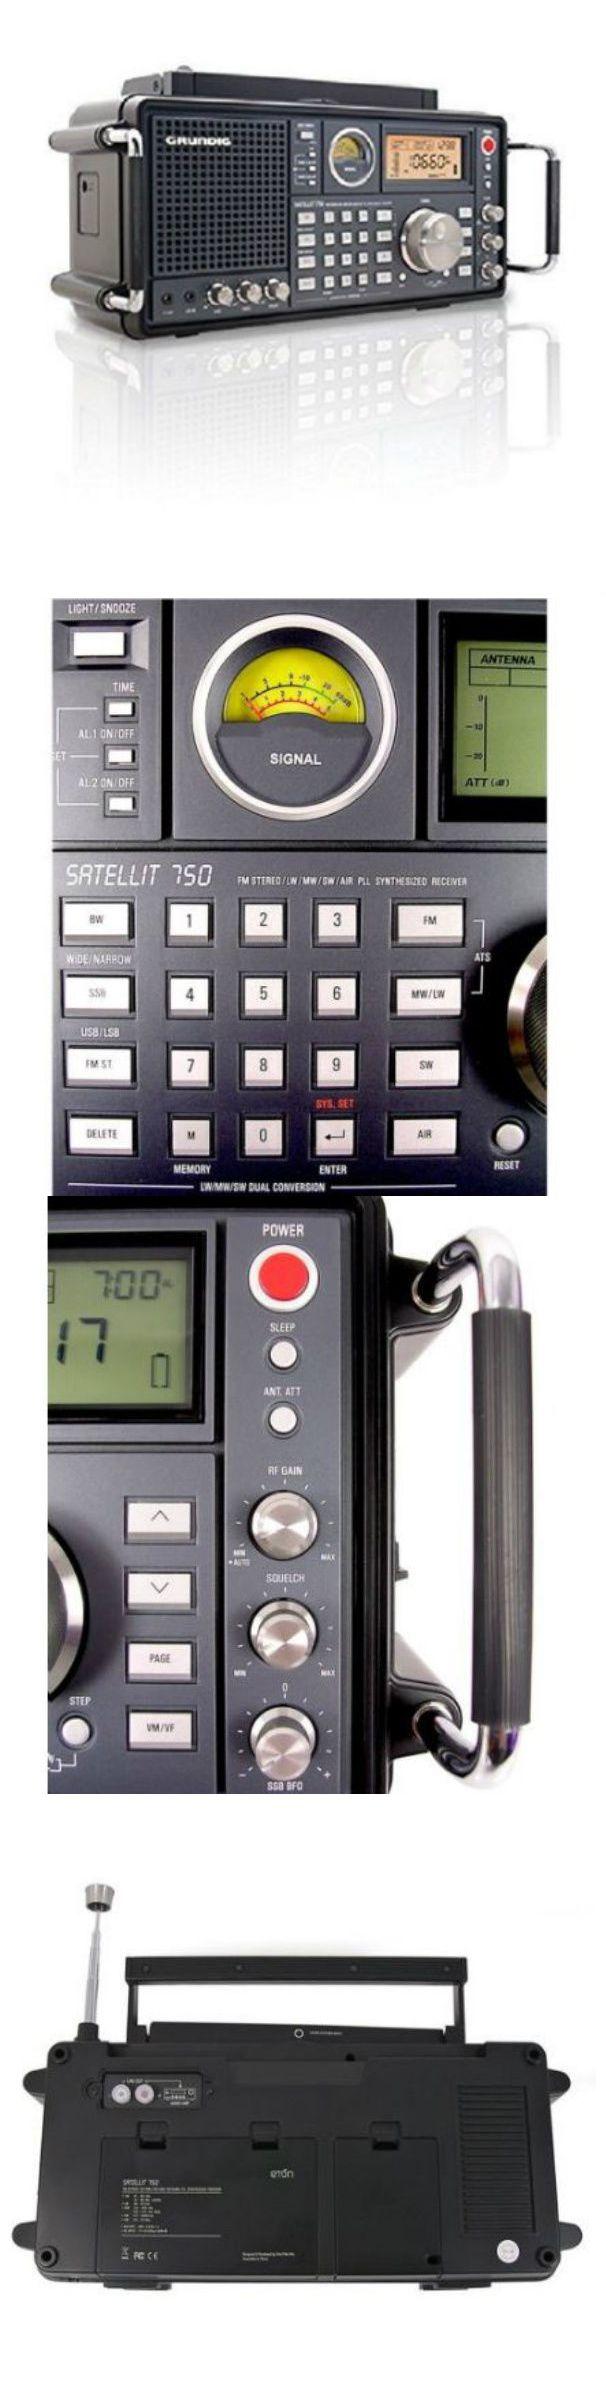 Ham Radio Receivers: Small Portable Radio Survival Dual Alarm Shortwave Receivers Eton Grundig Stereo -> BUY IT NOW ONLY: $424.99 on eBay!